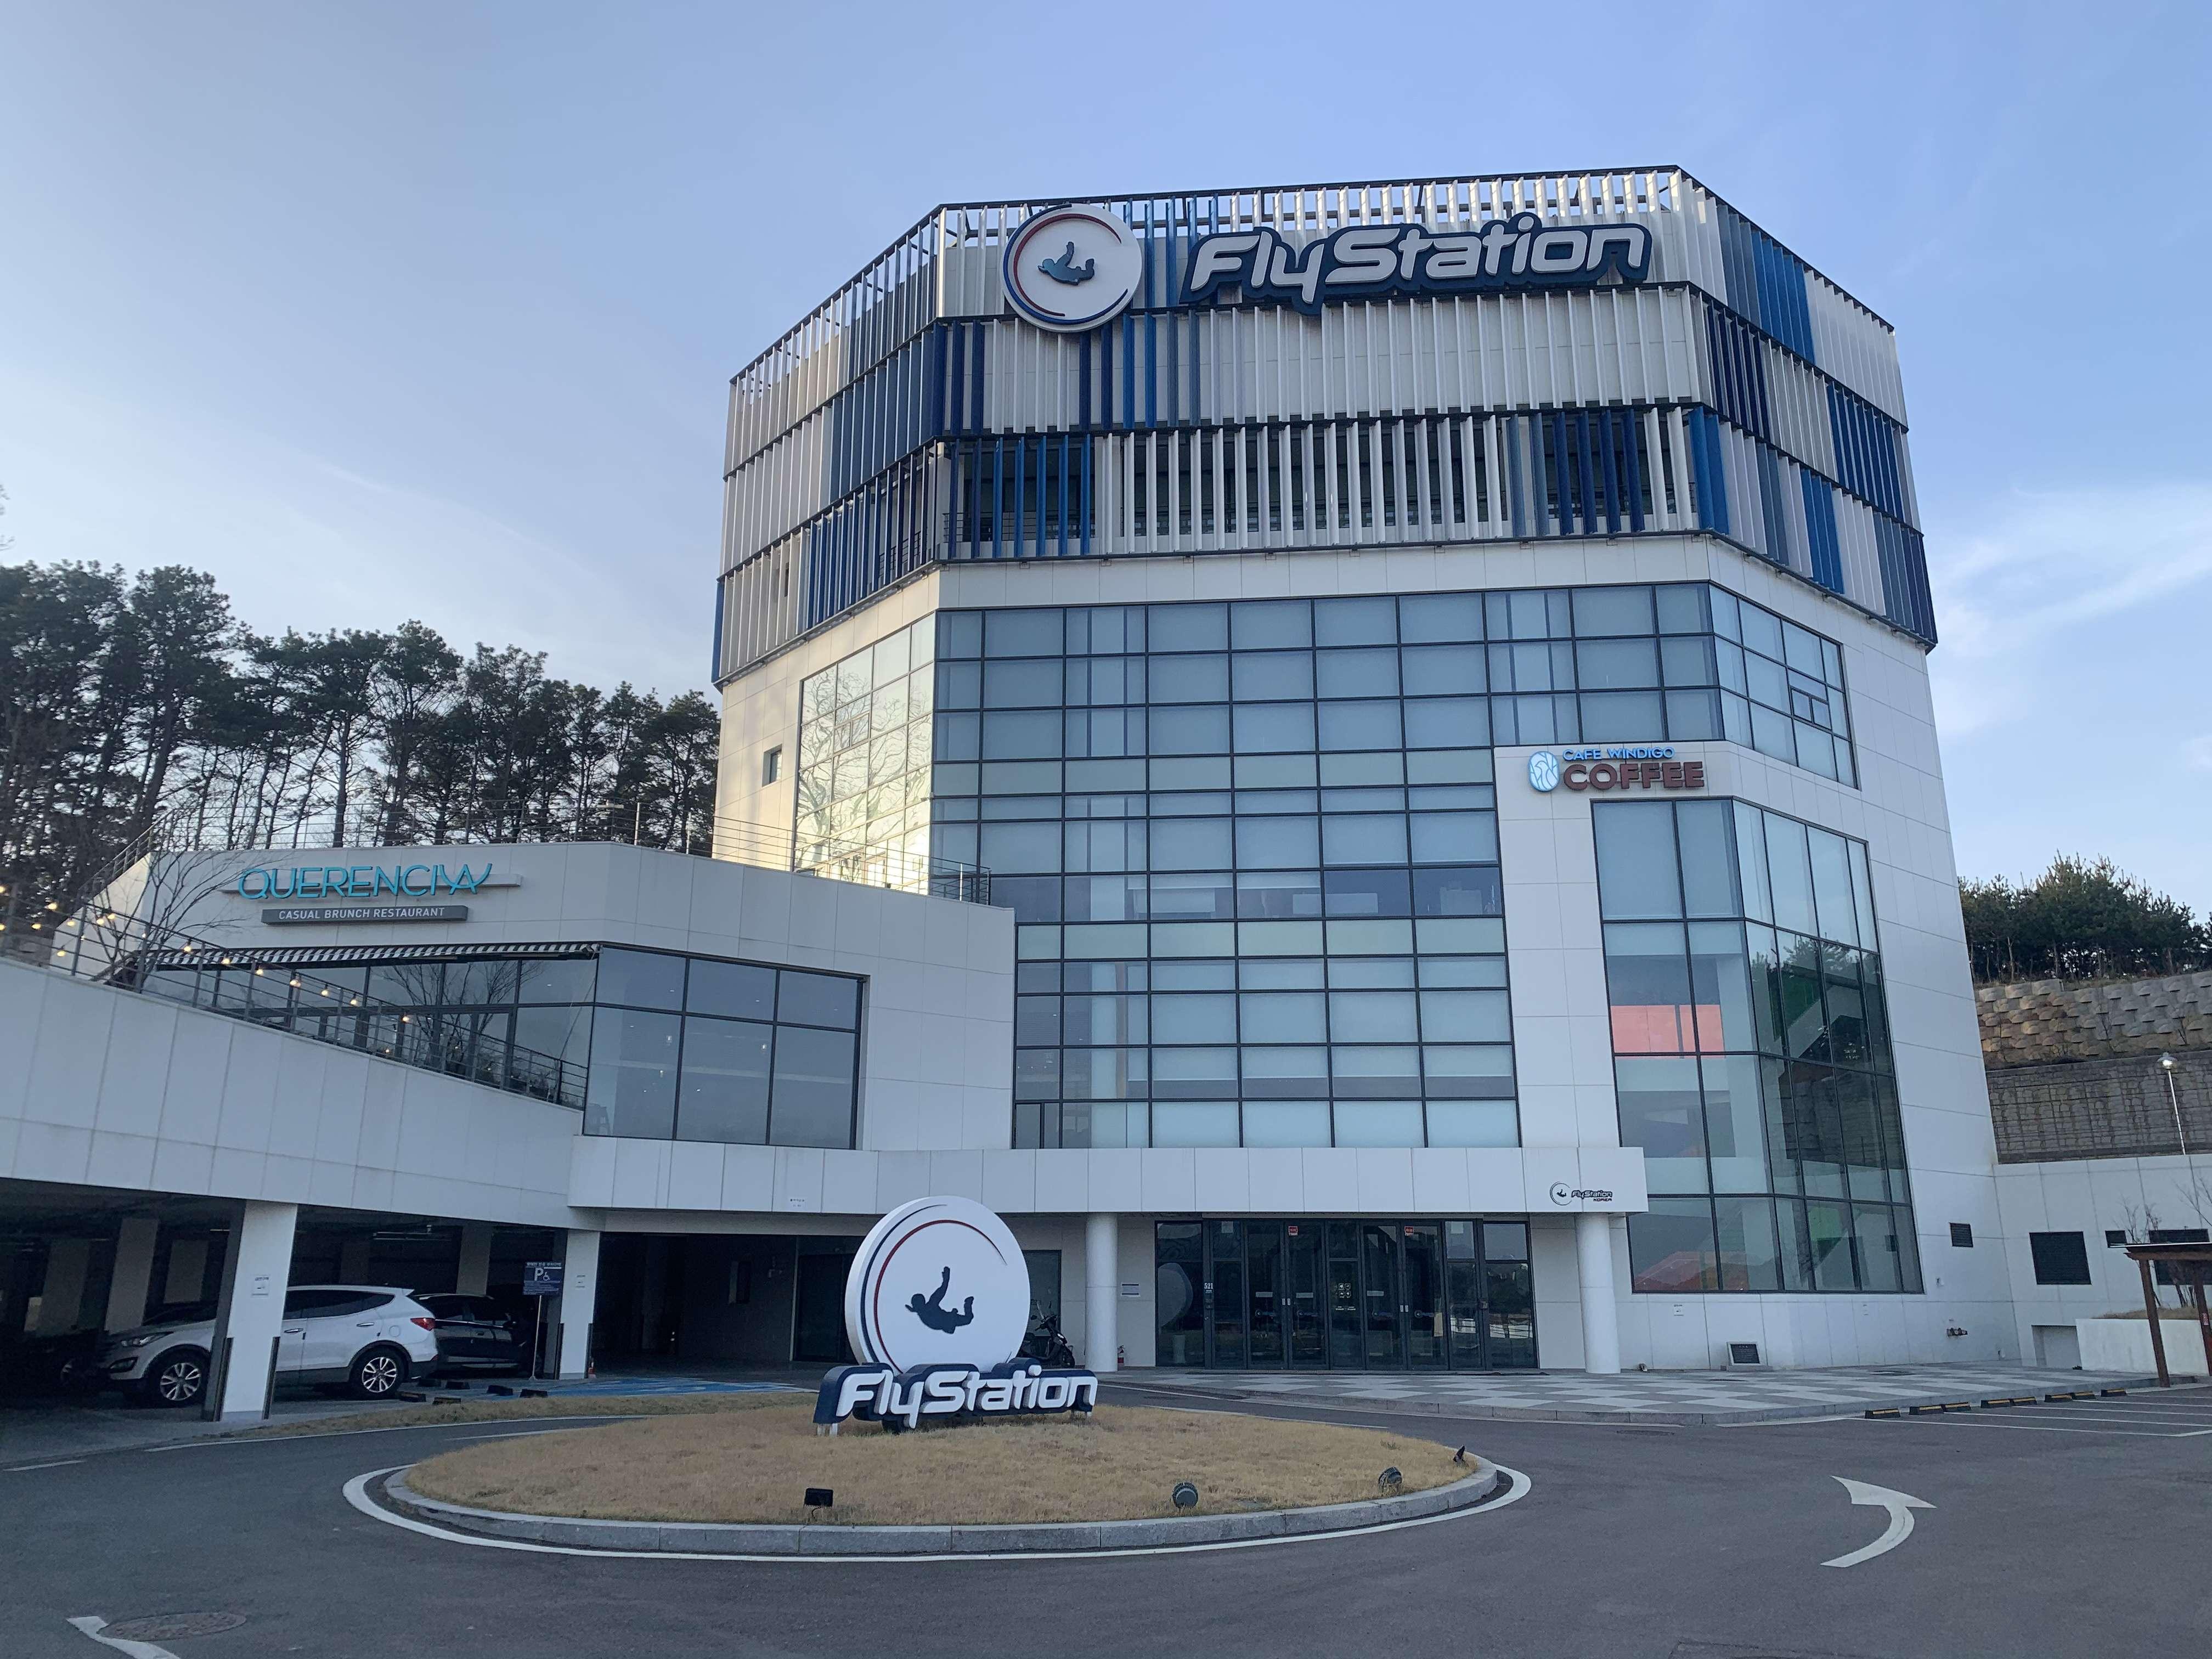 FLY STATION_韓國景點_韓遊網